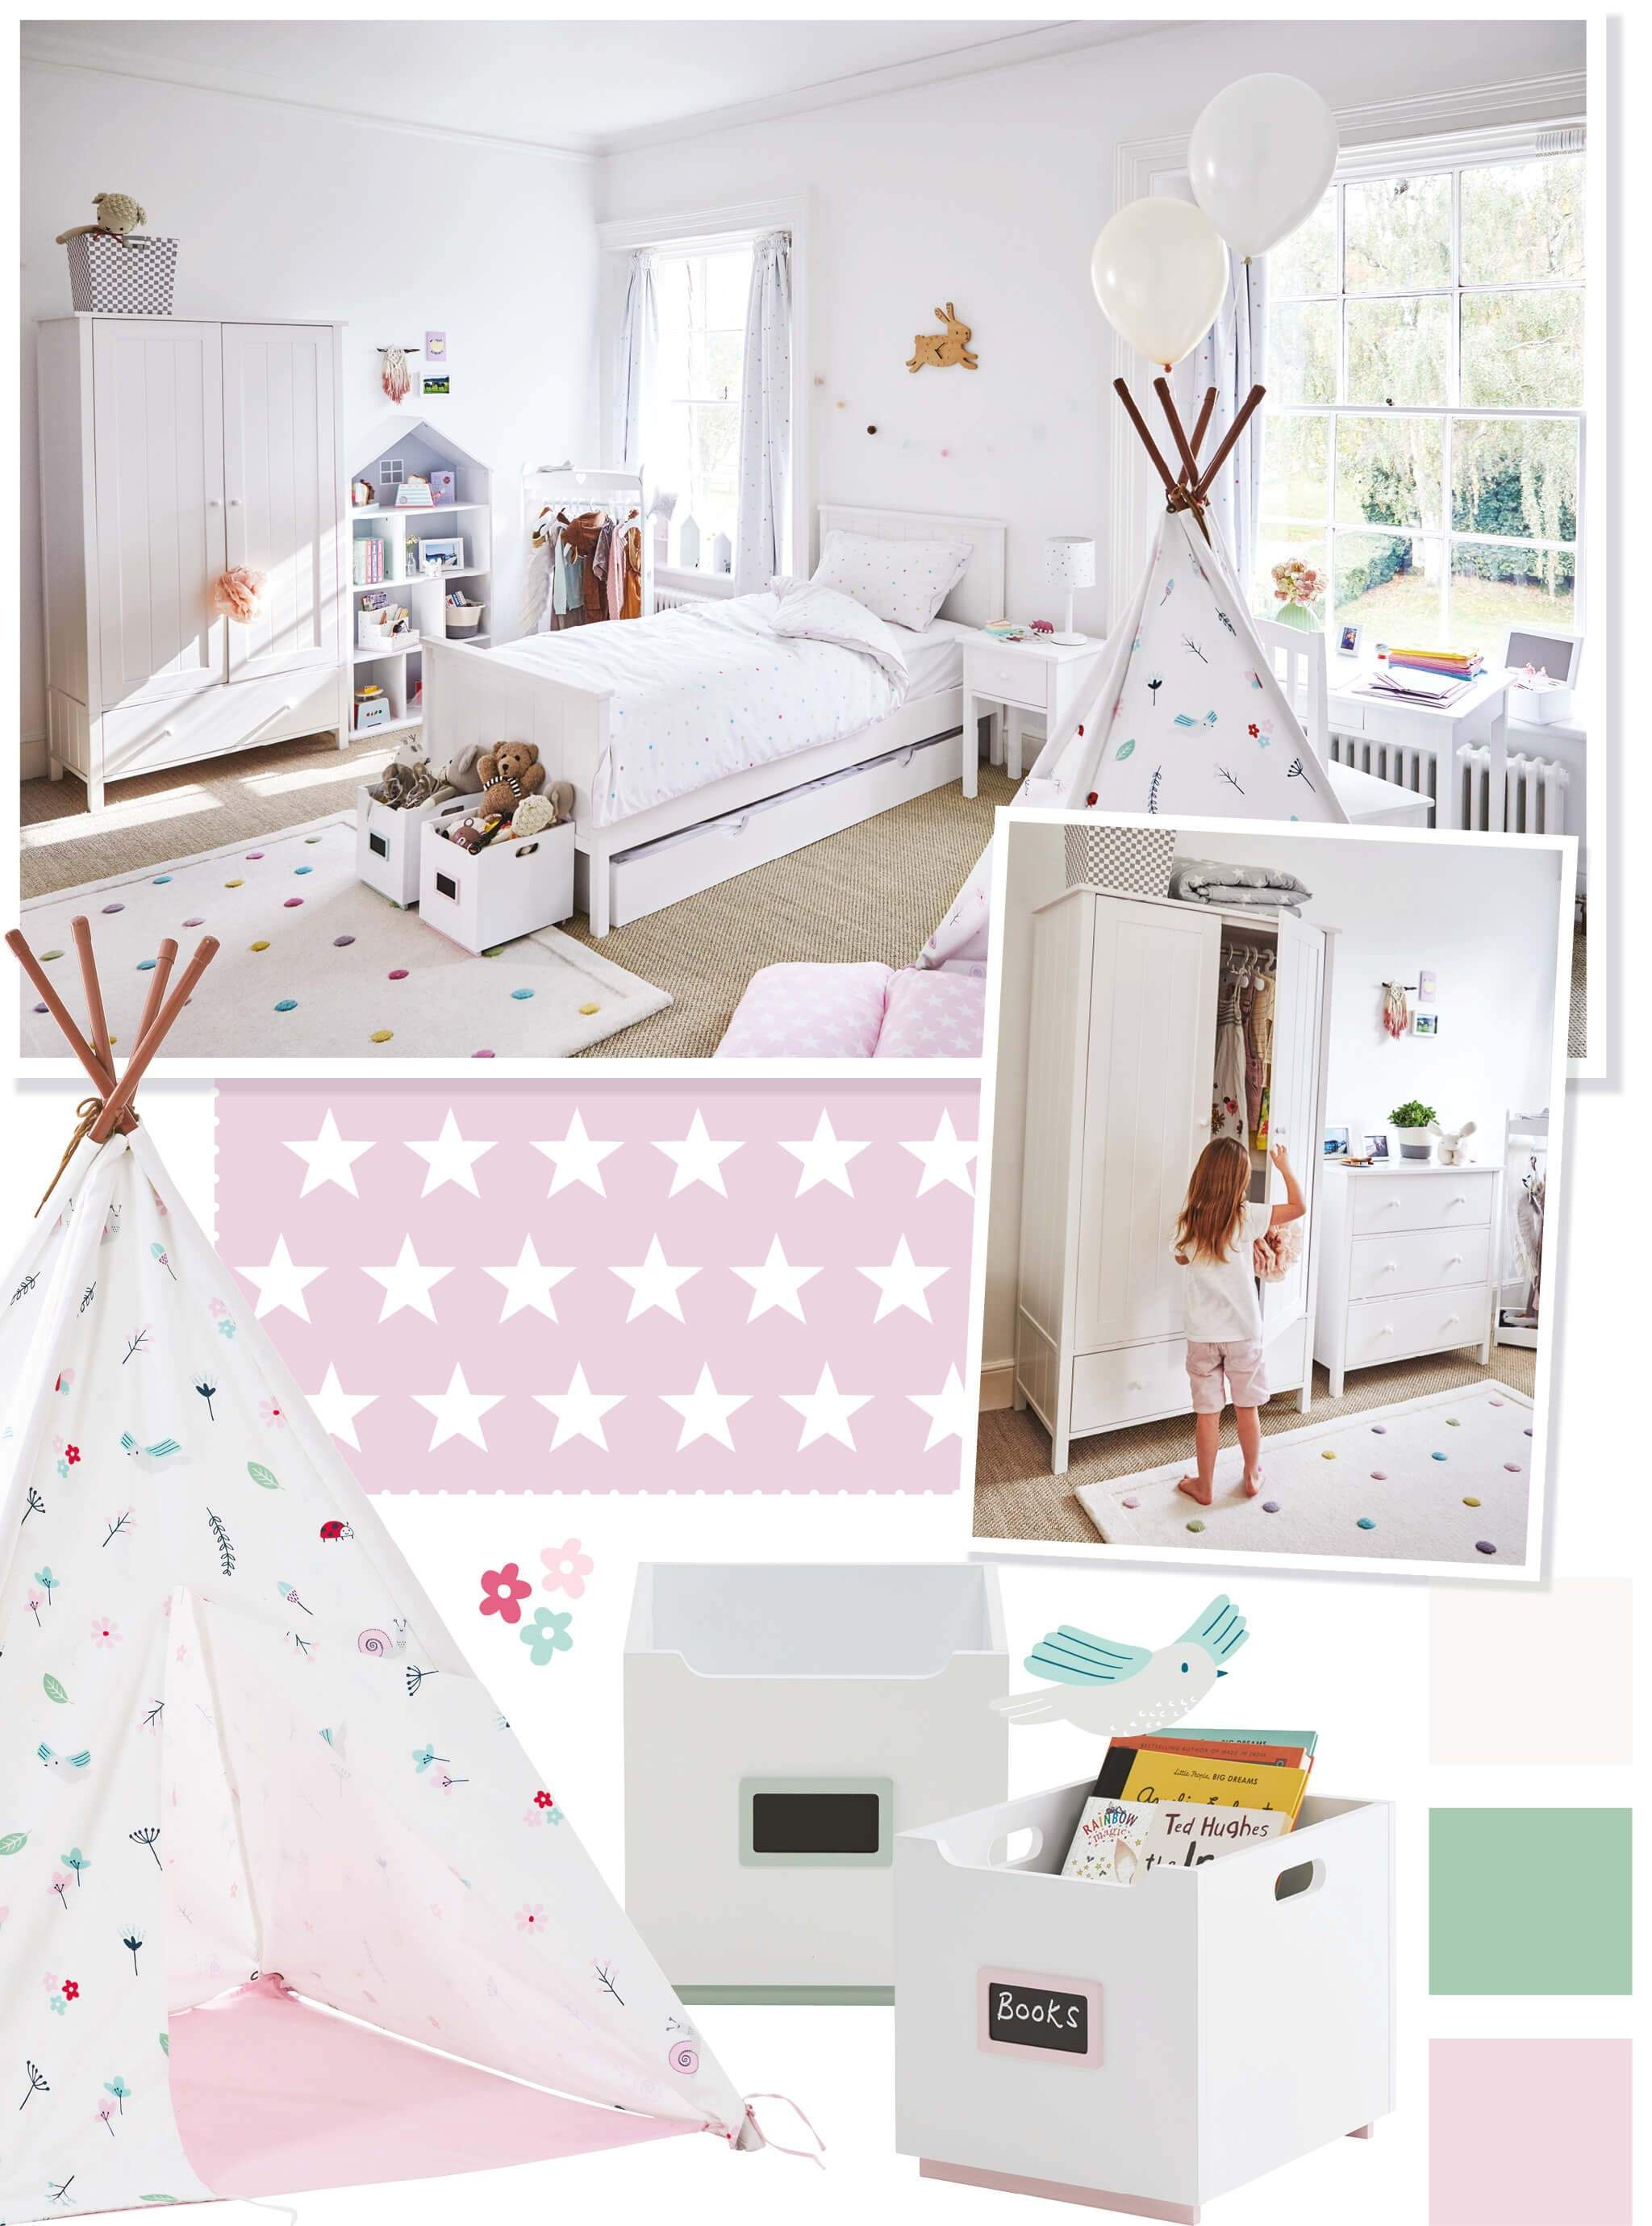 New children\'s bedroom ideas in 2019 | Pink themed ...